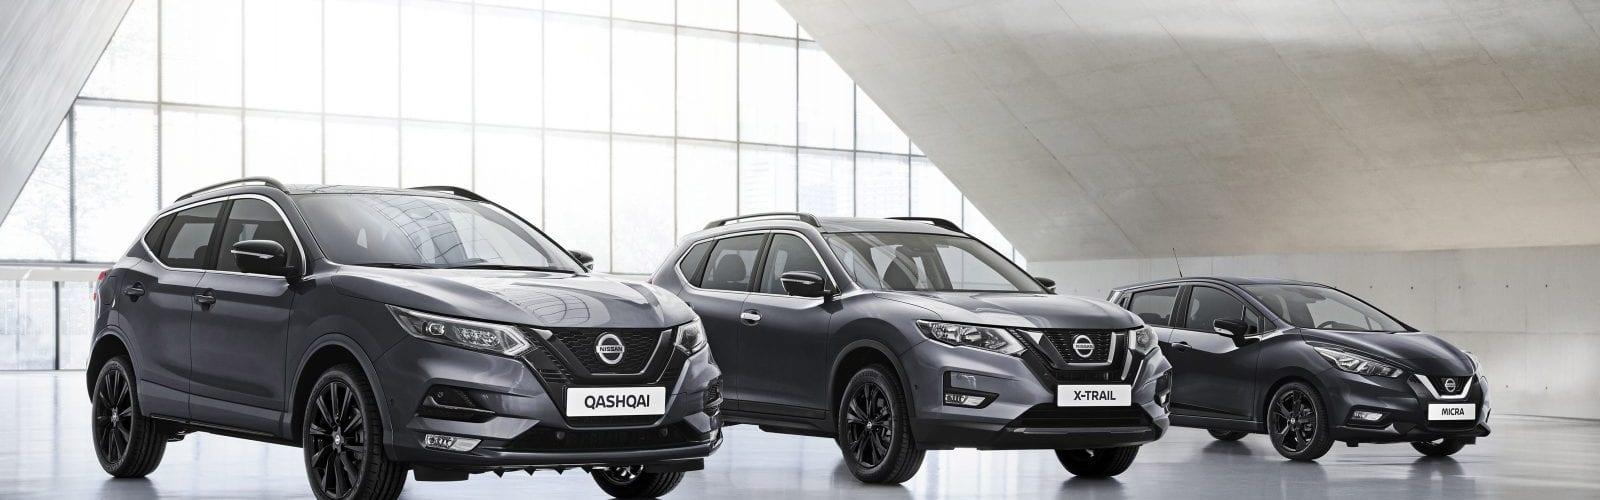 Nissan Micra - Qashqai - X-Trail